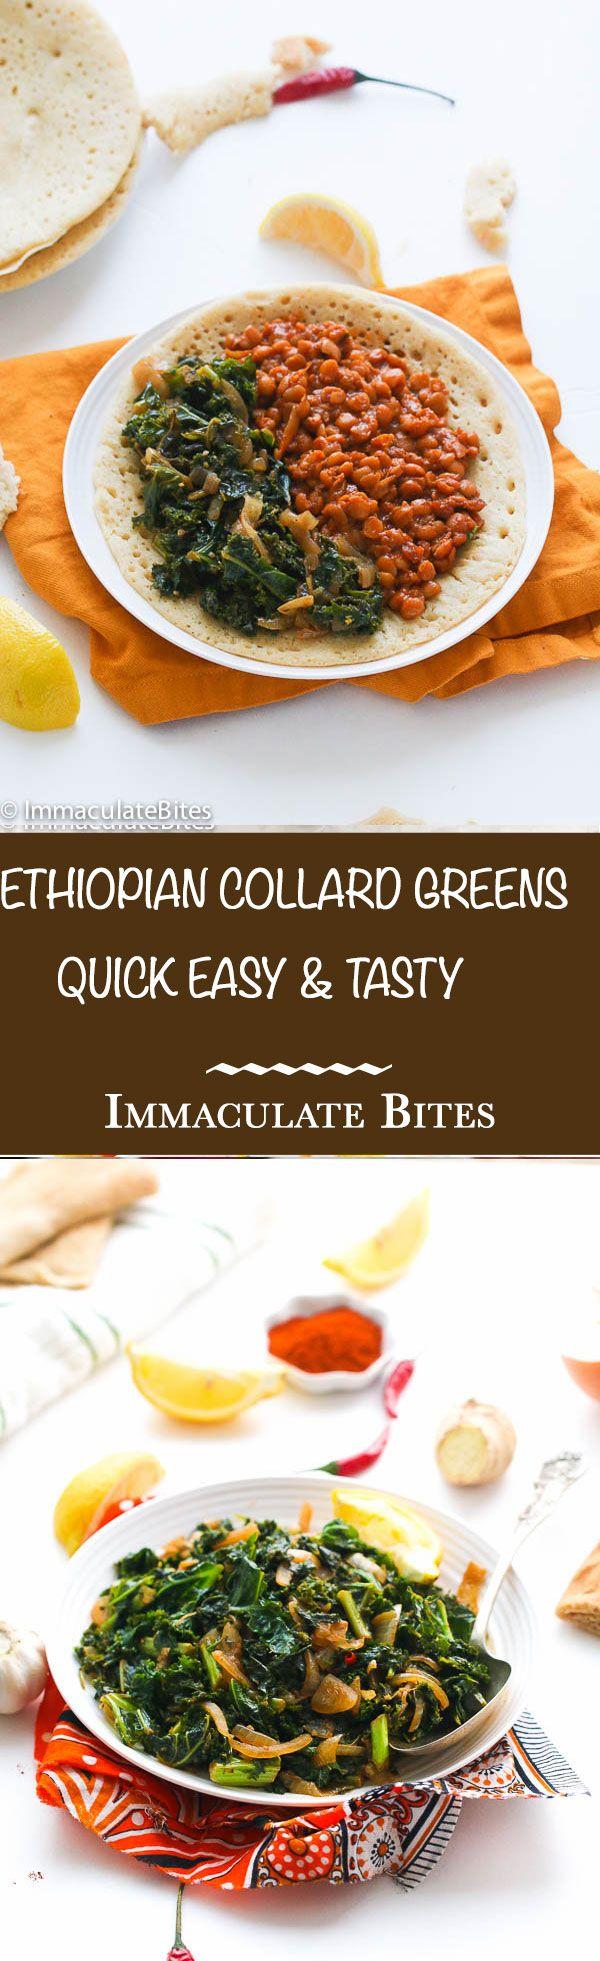 Ethiopian Collard Greens aka Ye'abasha Gomen- Braised collard greens and kale seasoned with aromatics; Quick, easy and tasty.